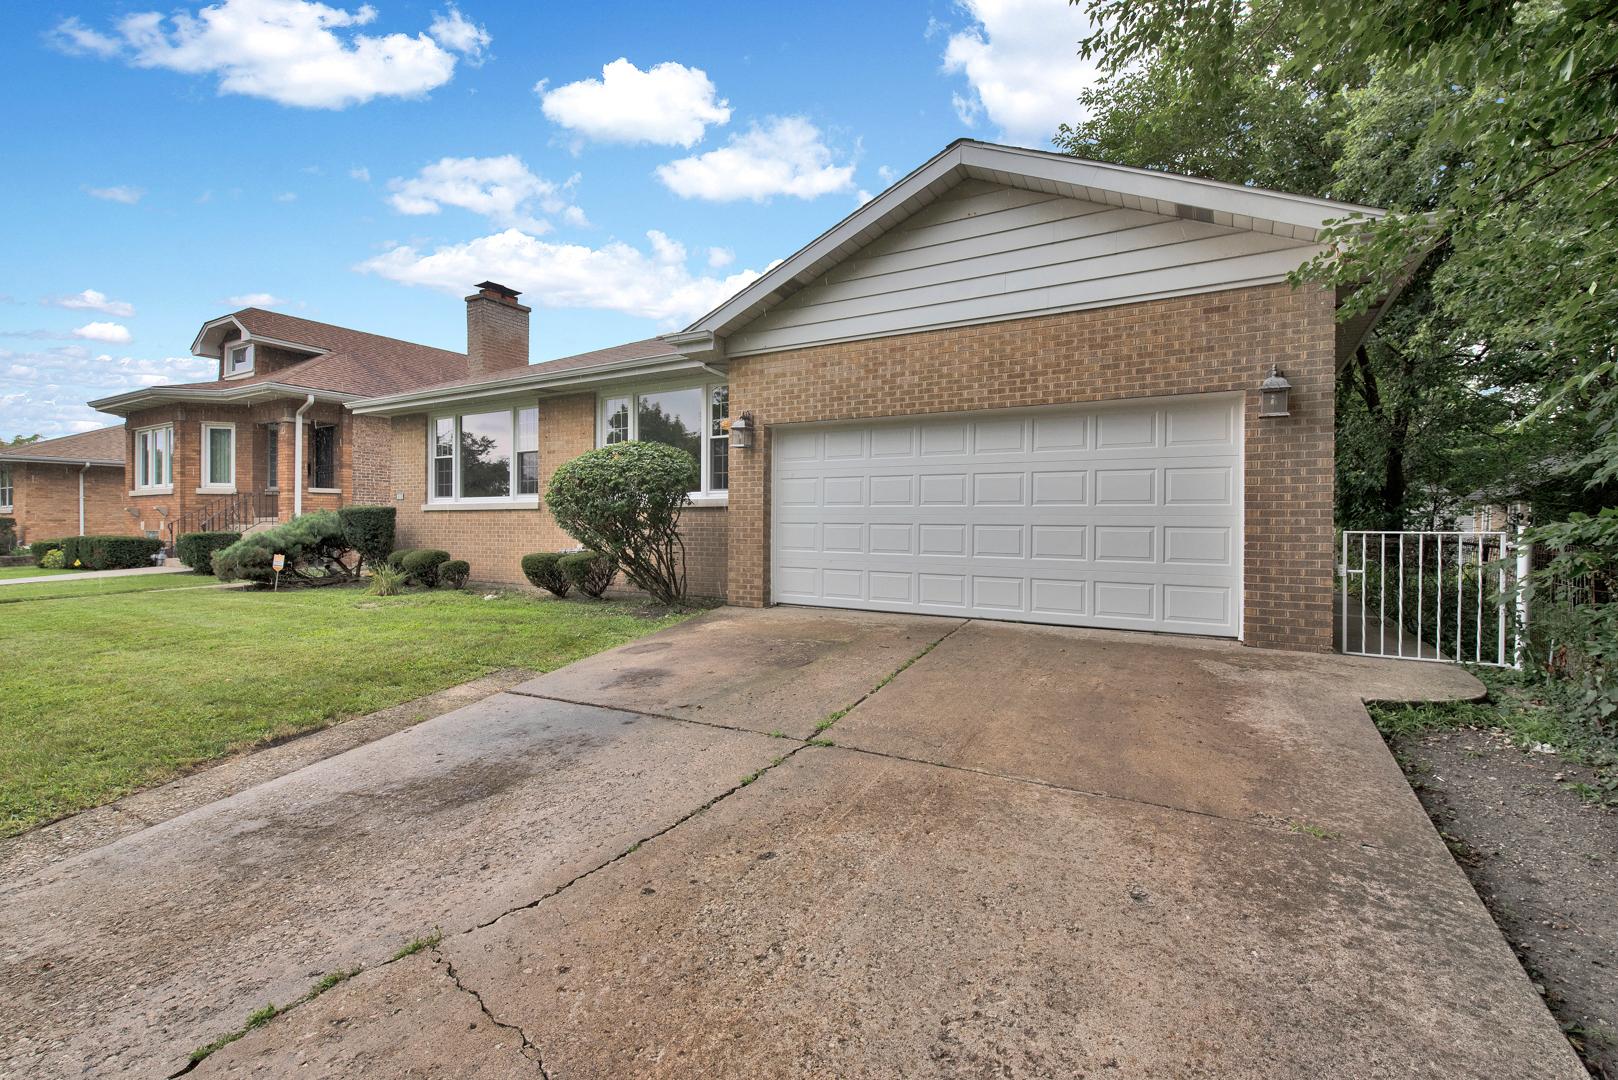 1636 South 14th, Maywood, Illinois, 60153